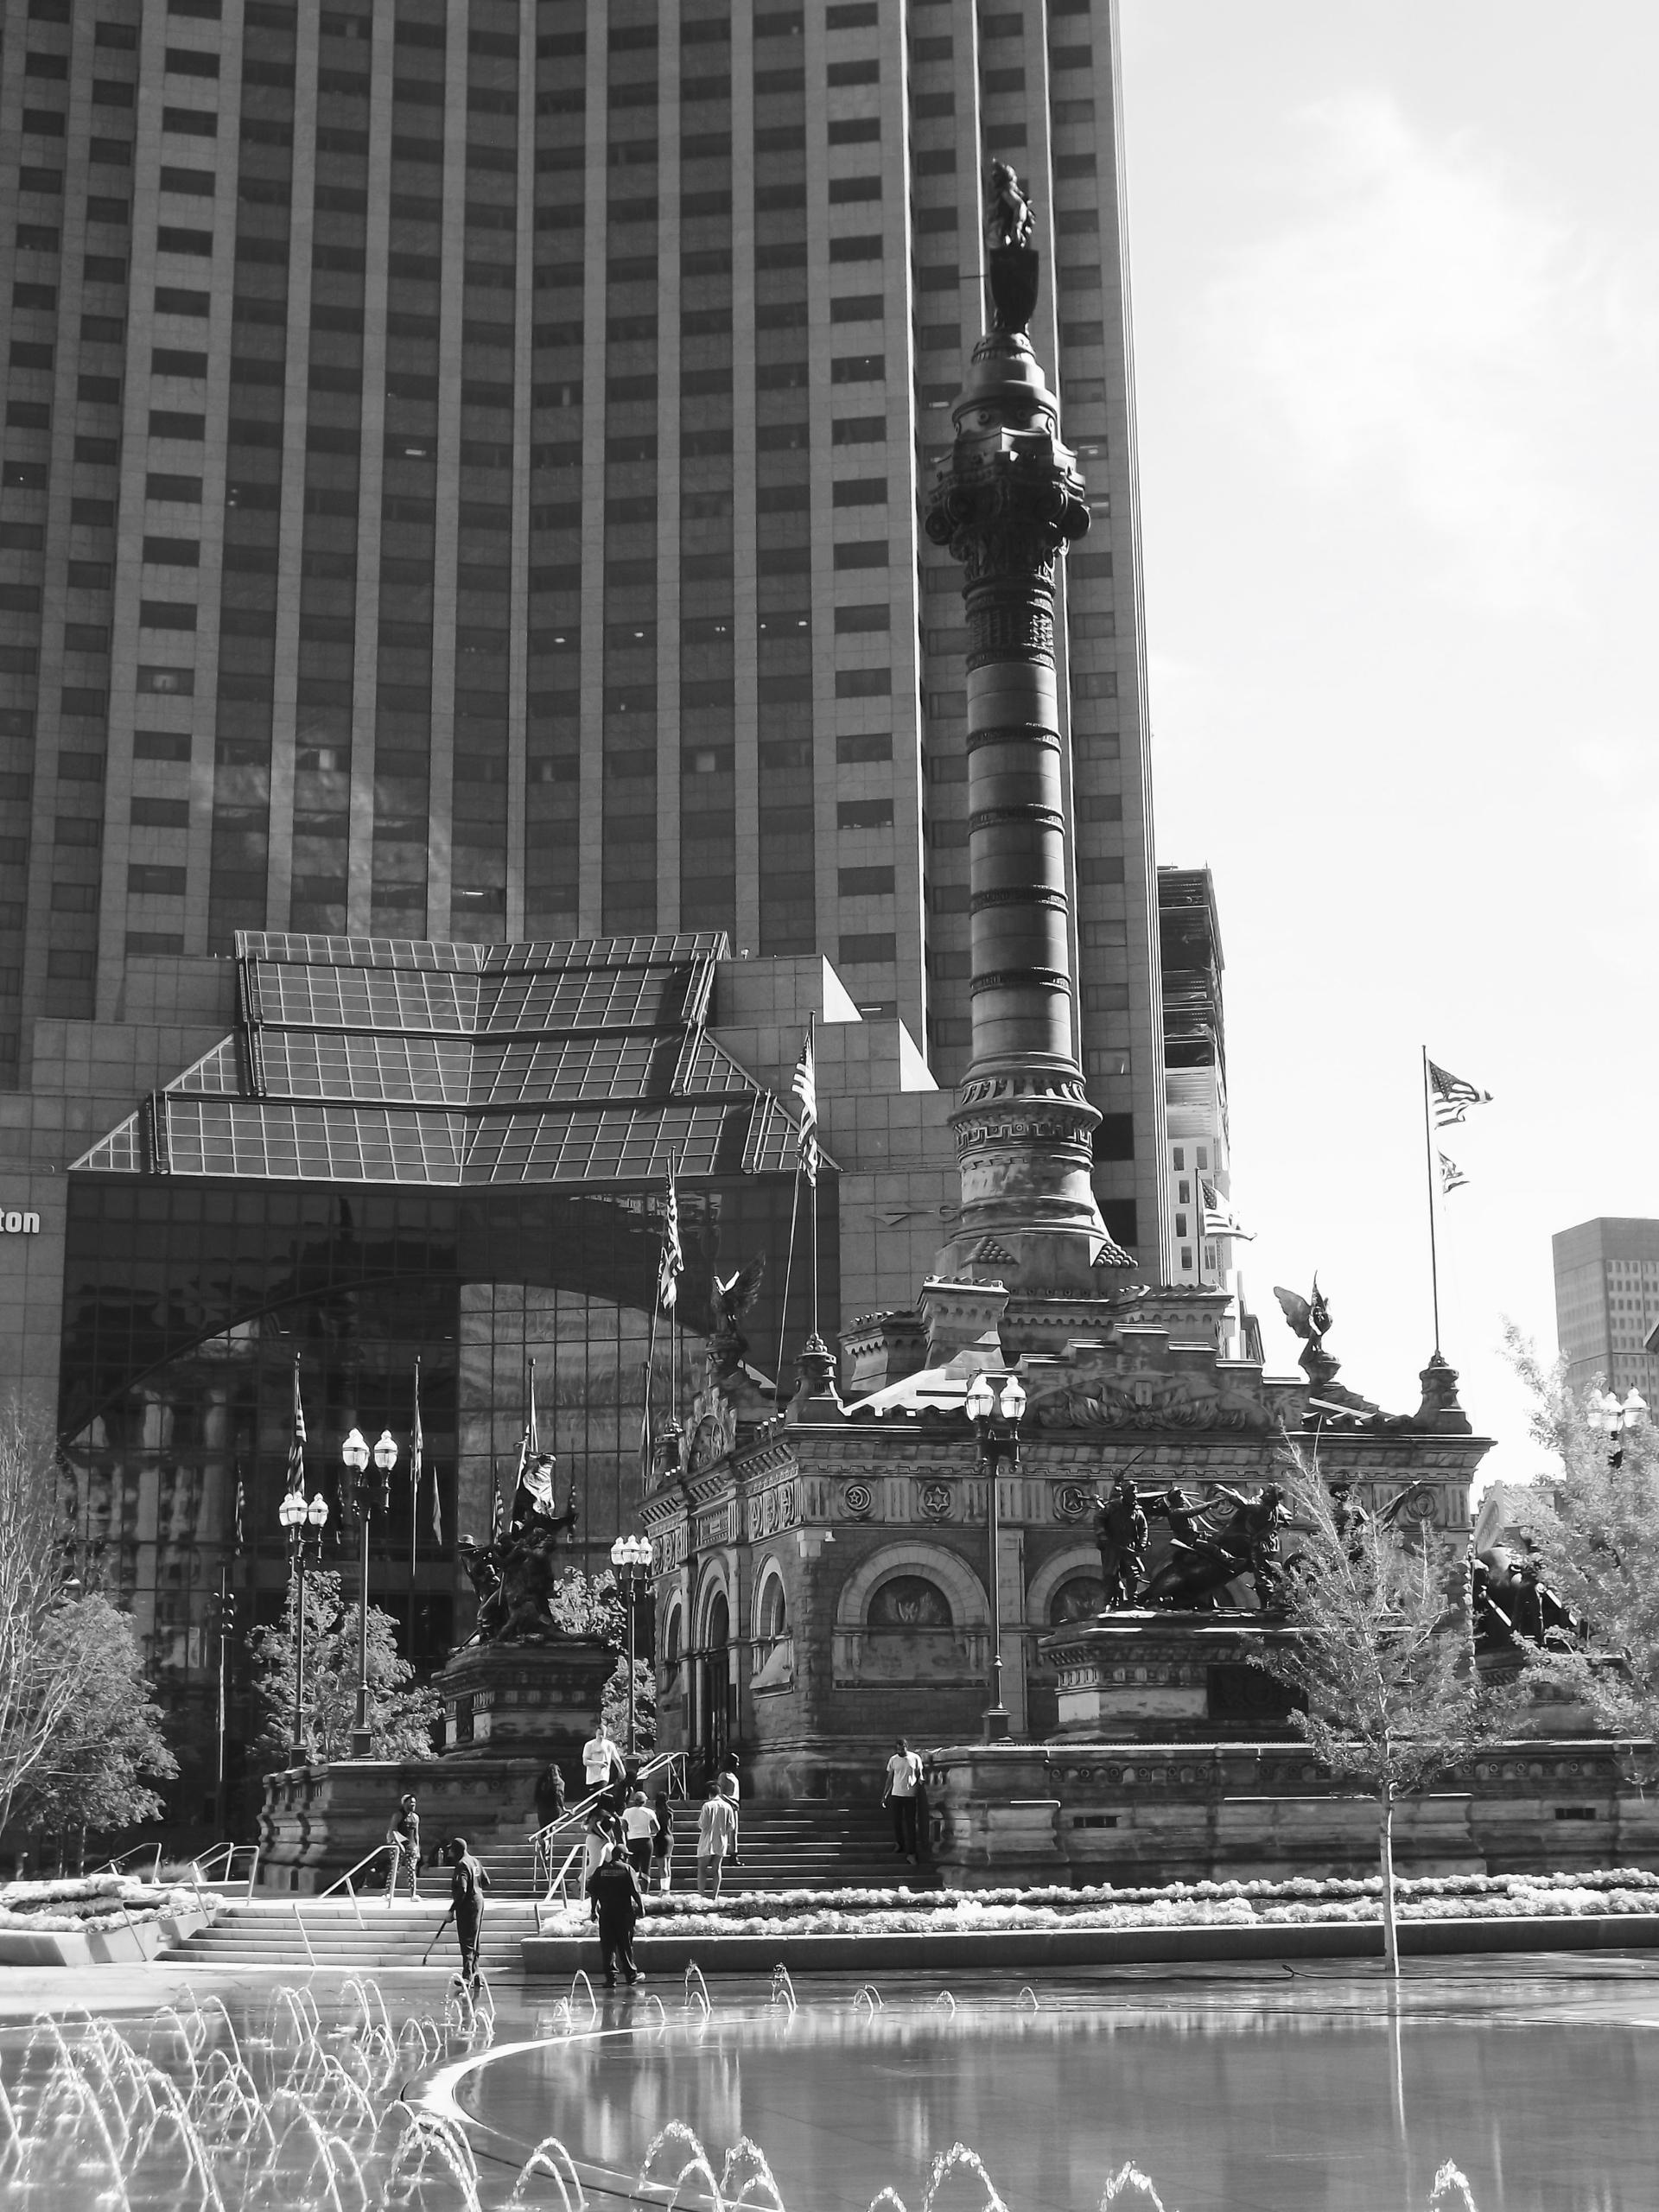 Monument Public Square Clevelan - twogreenthumbs | ello